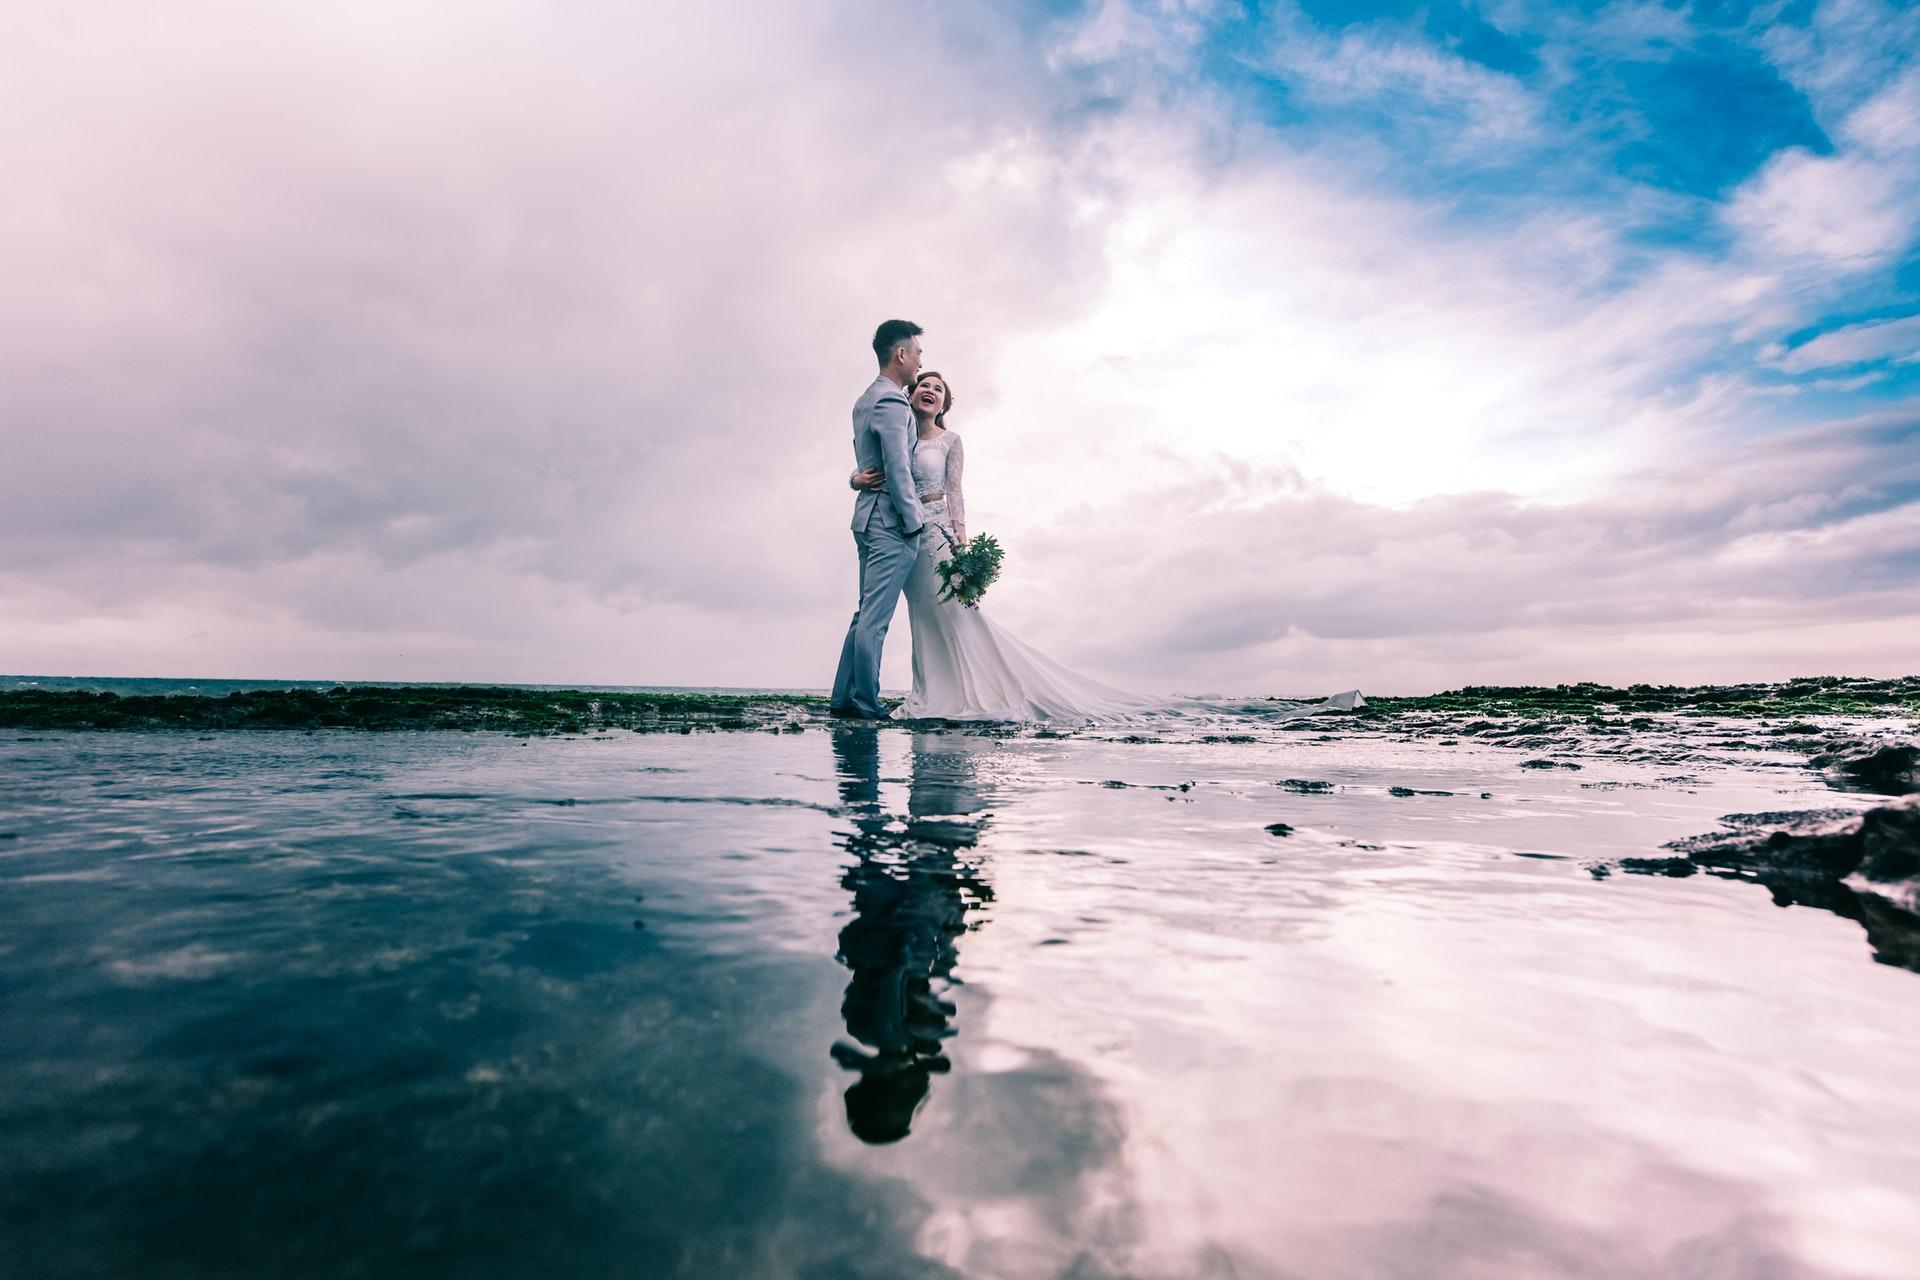 casal com roupa de casamento na praia